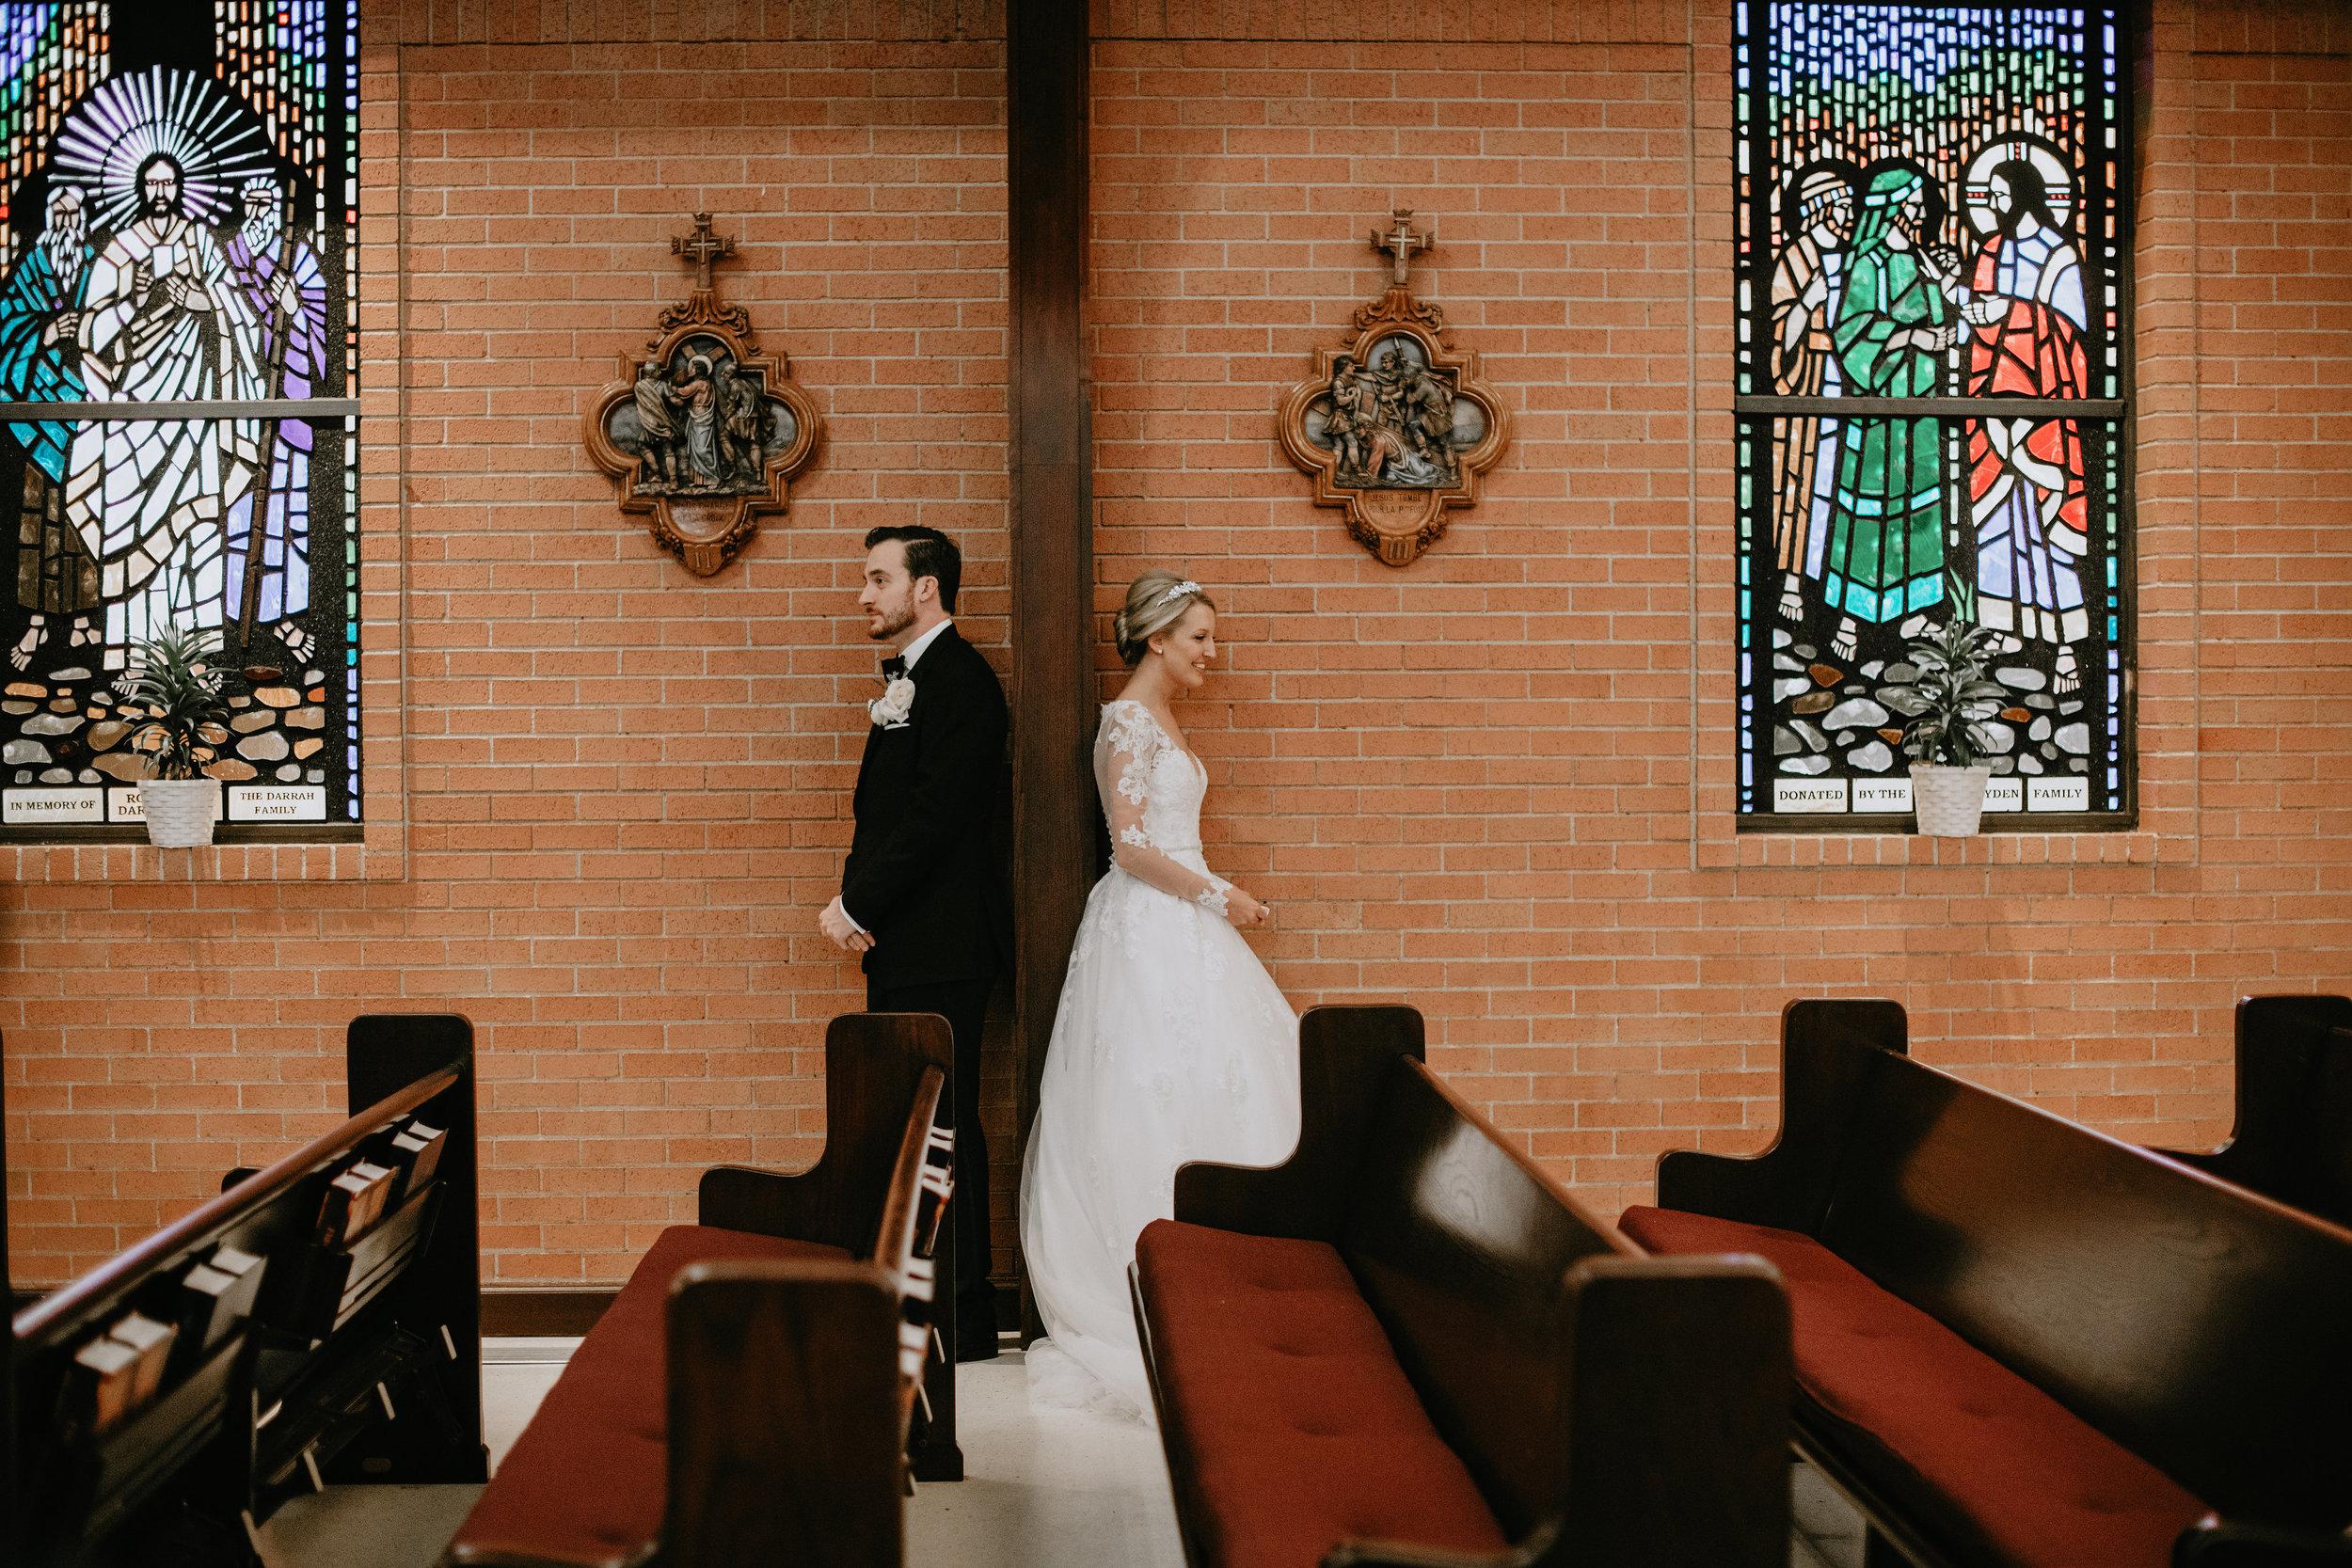 Patterson_Wedding_First_Look_004.jpg